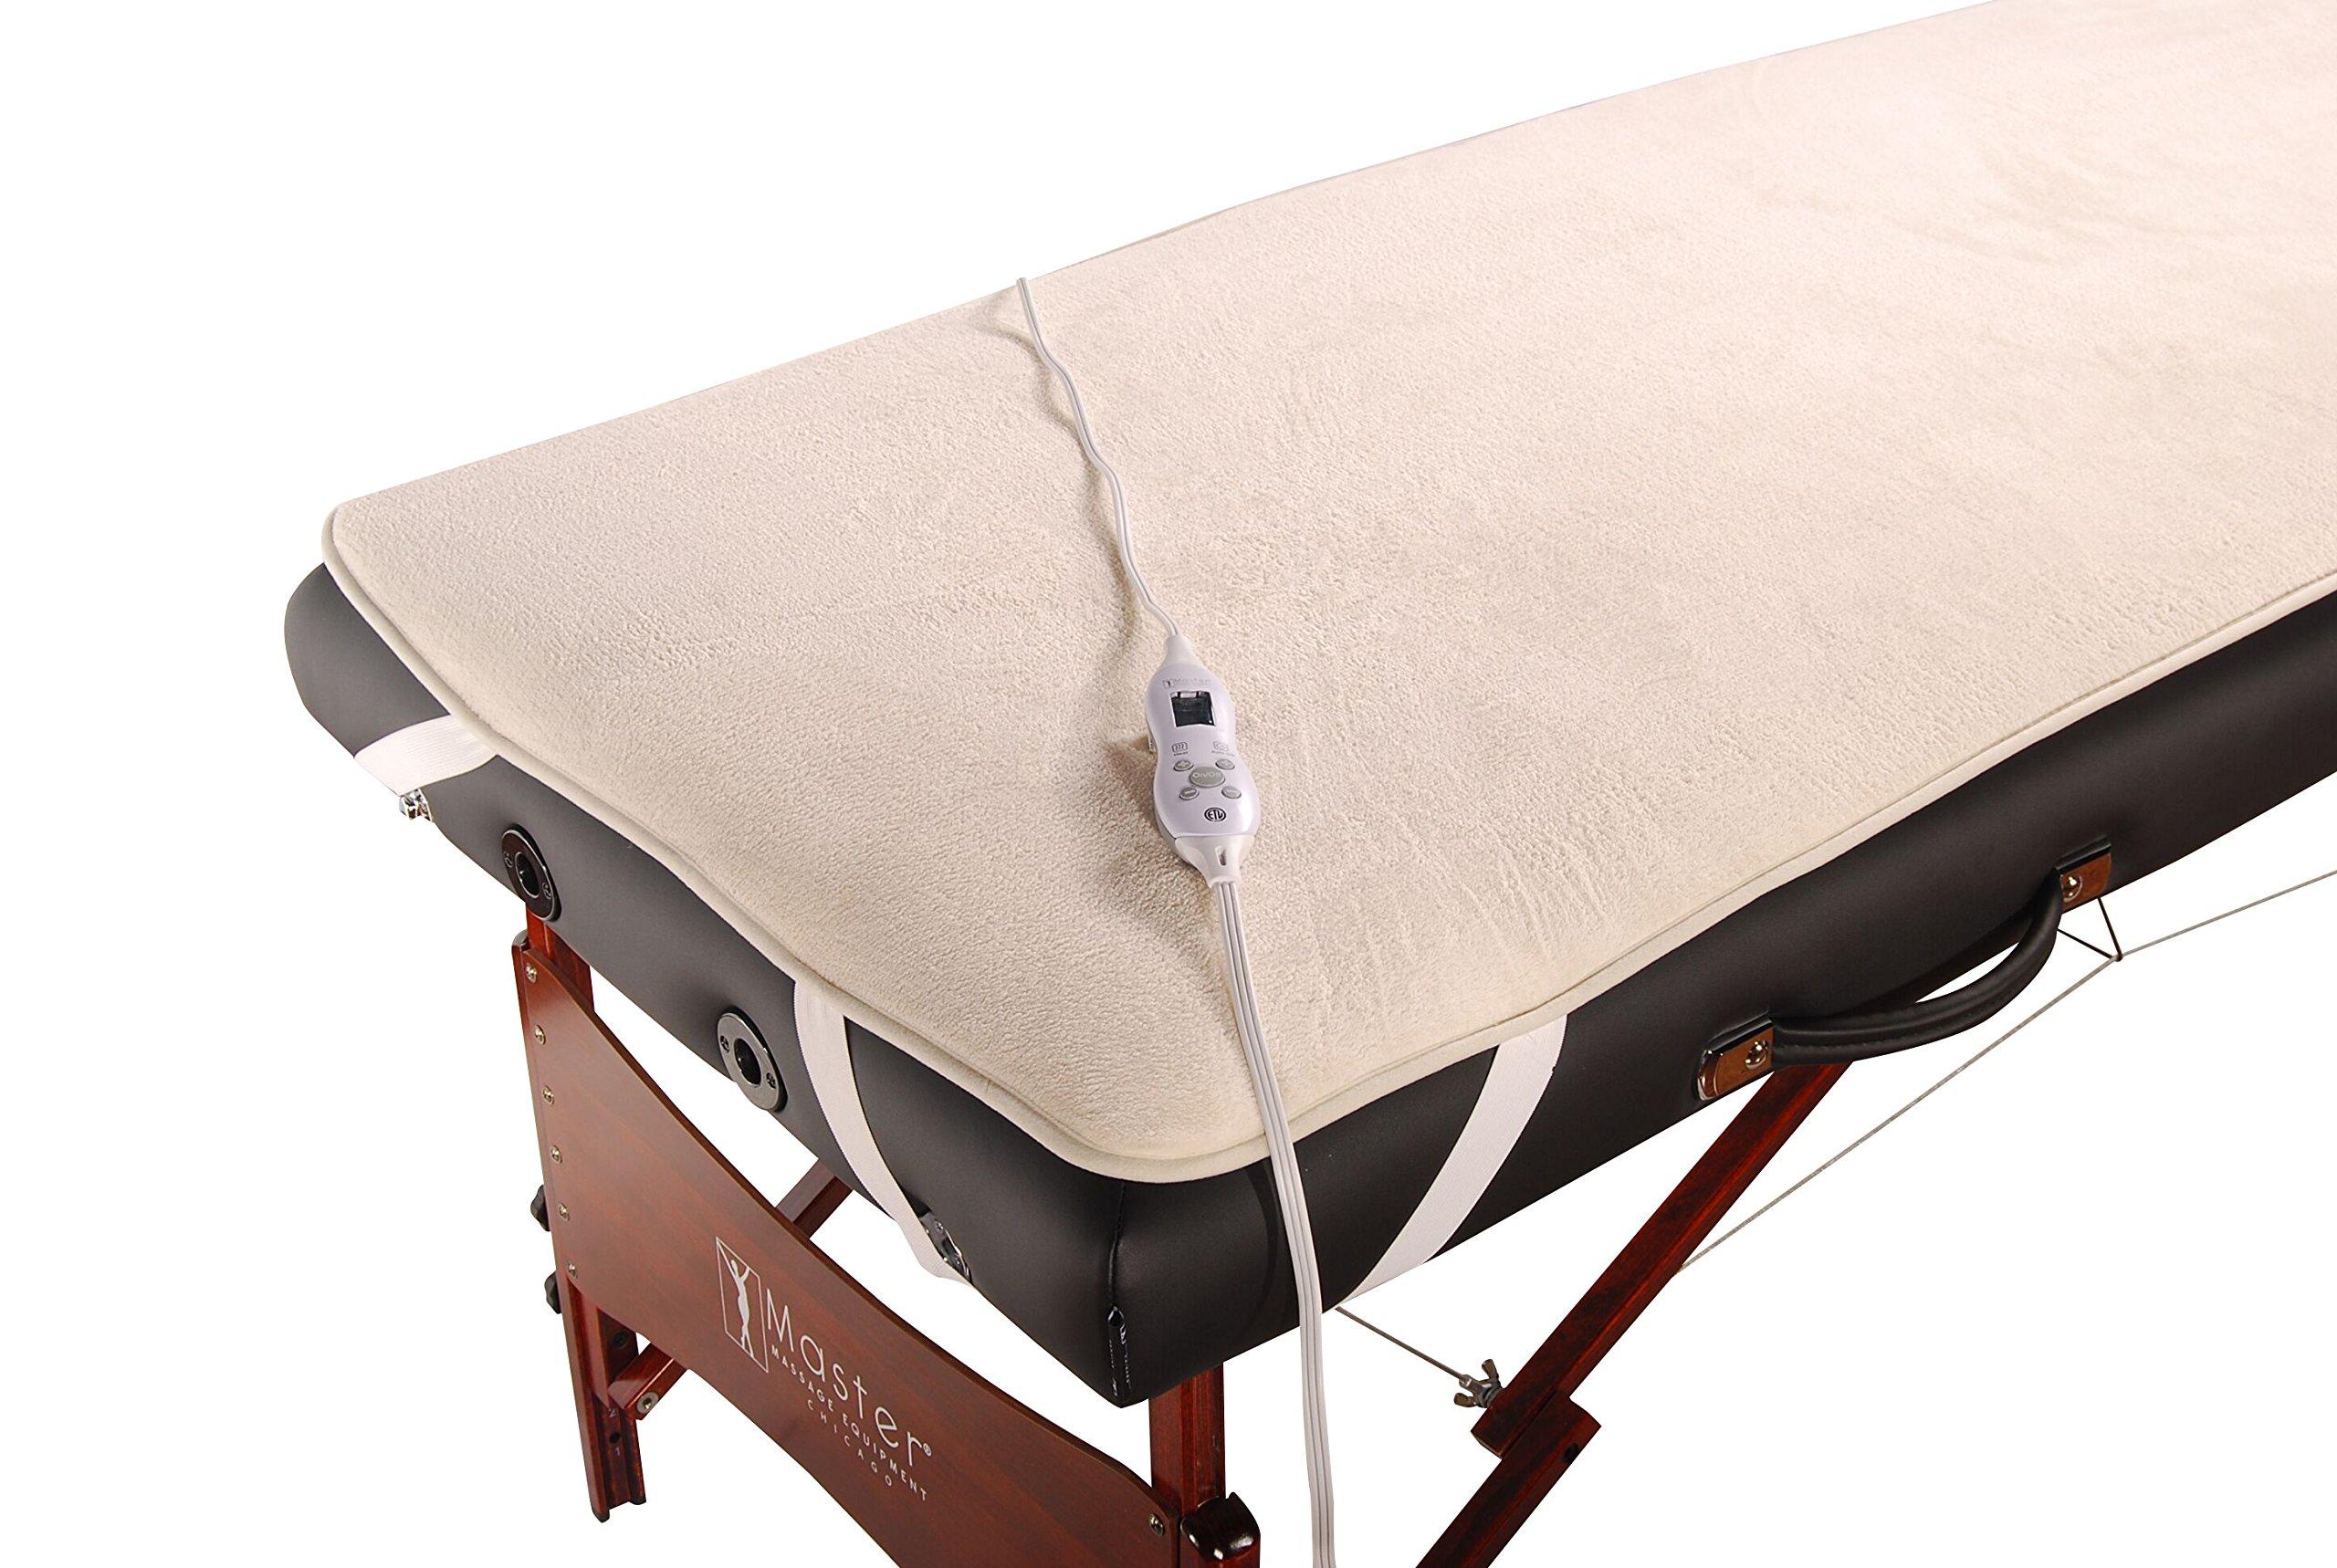 Master Massage UL Listed Massage Table Warmer